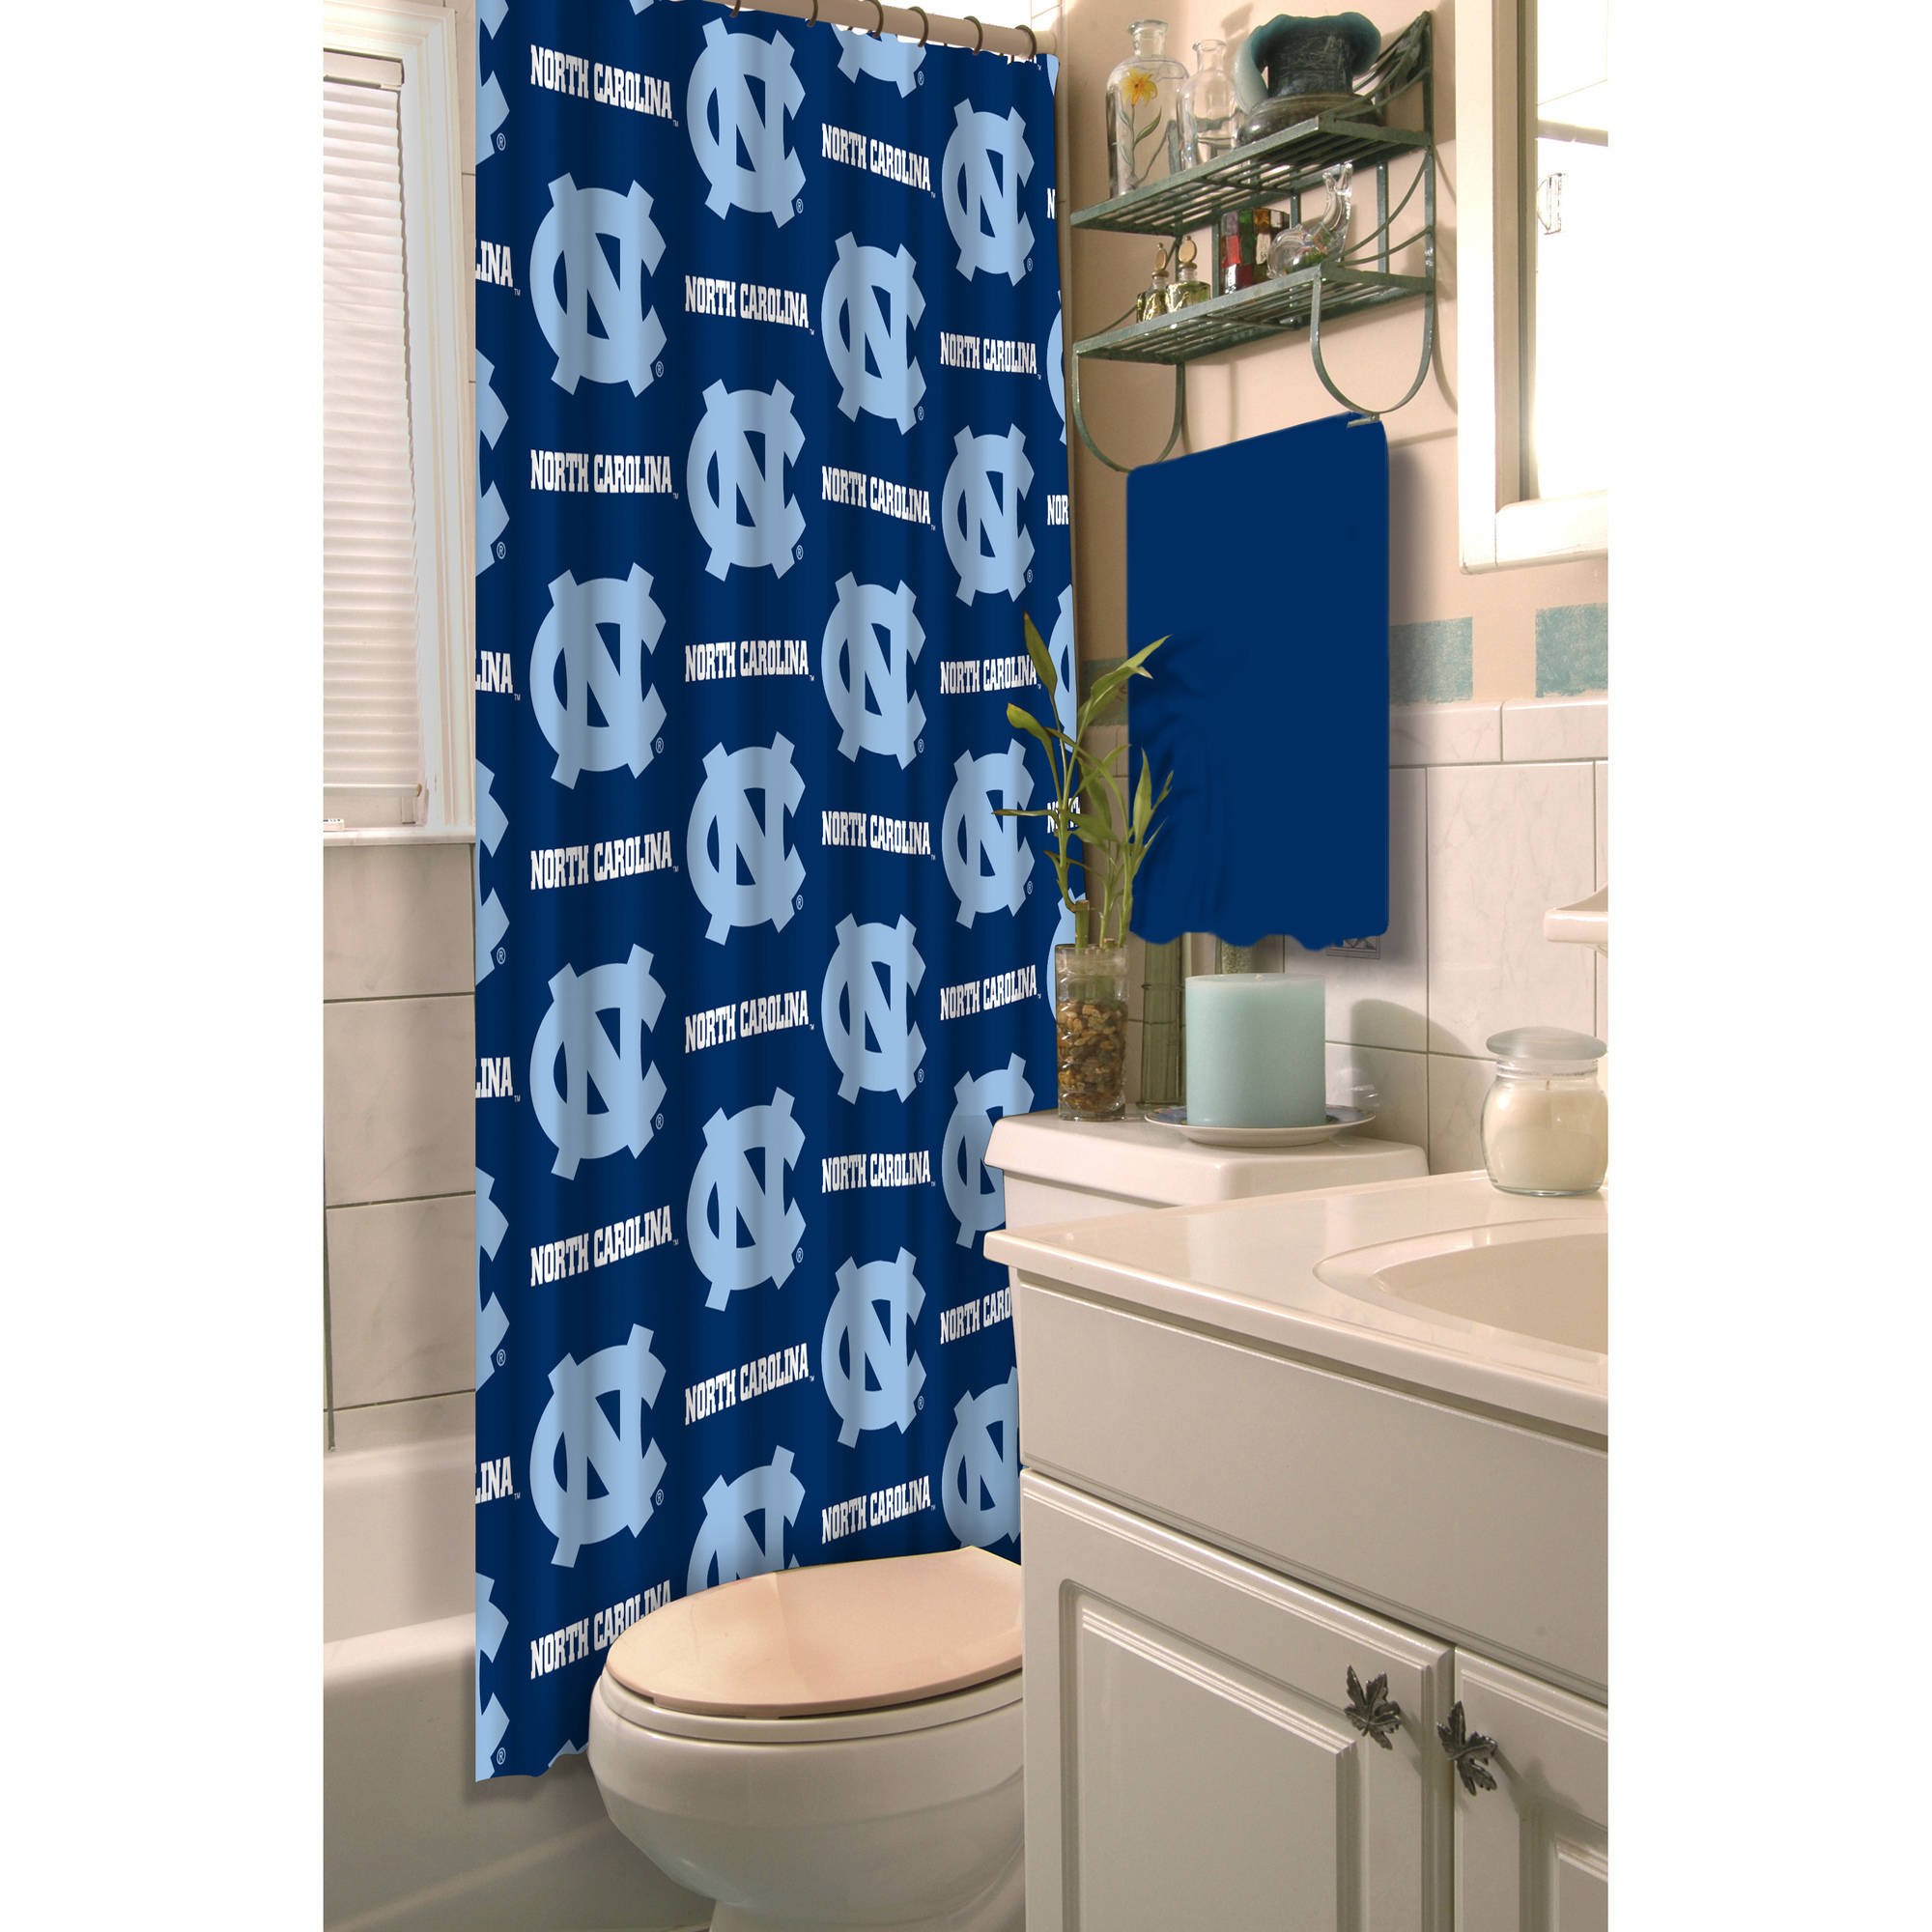 NCAA University of North Carolina Shower Curtain, 1 Each